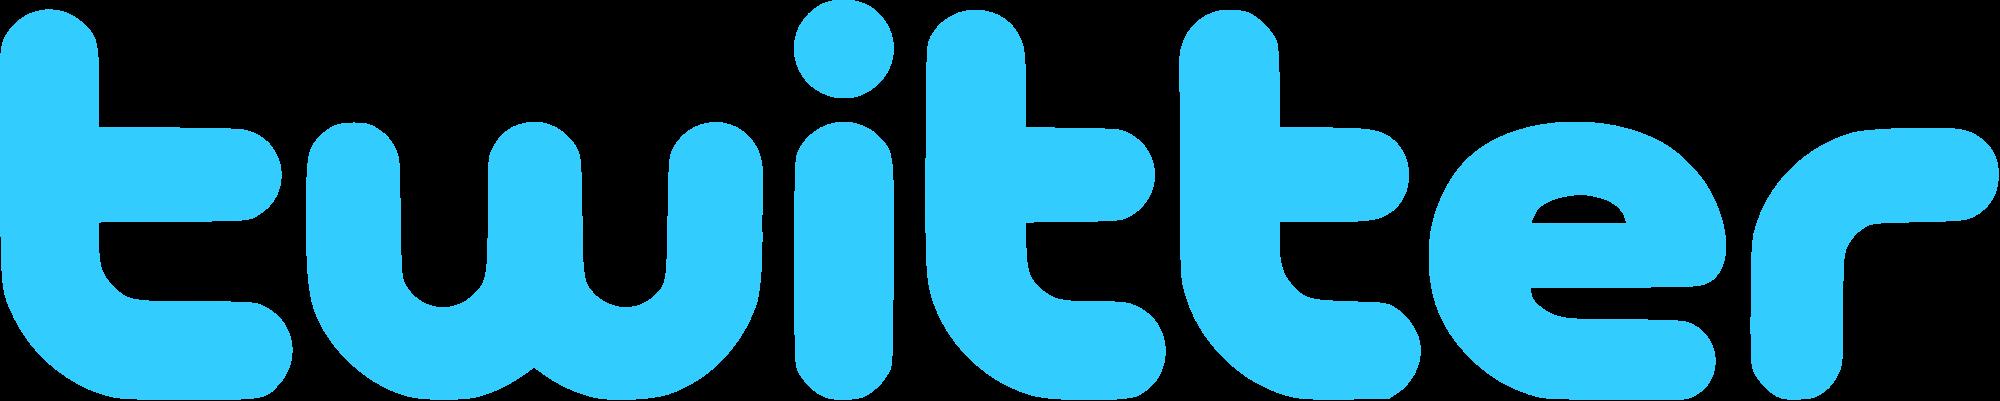 500+ Twitter LOGO - Latest Twitter Logo, Icon, GIF ...